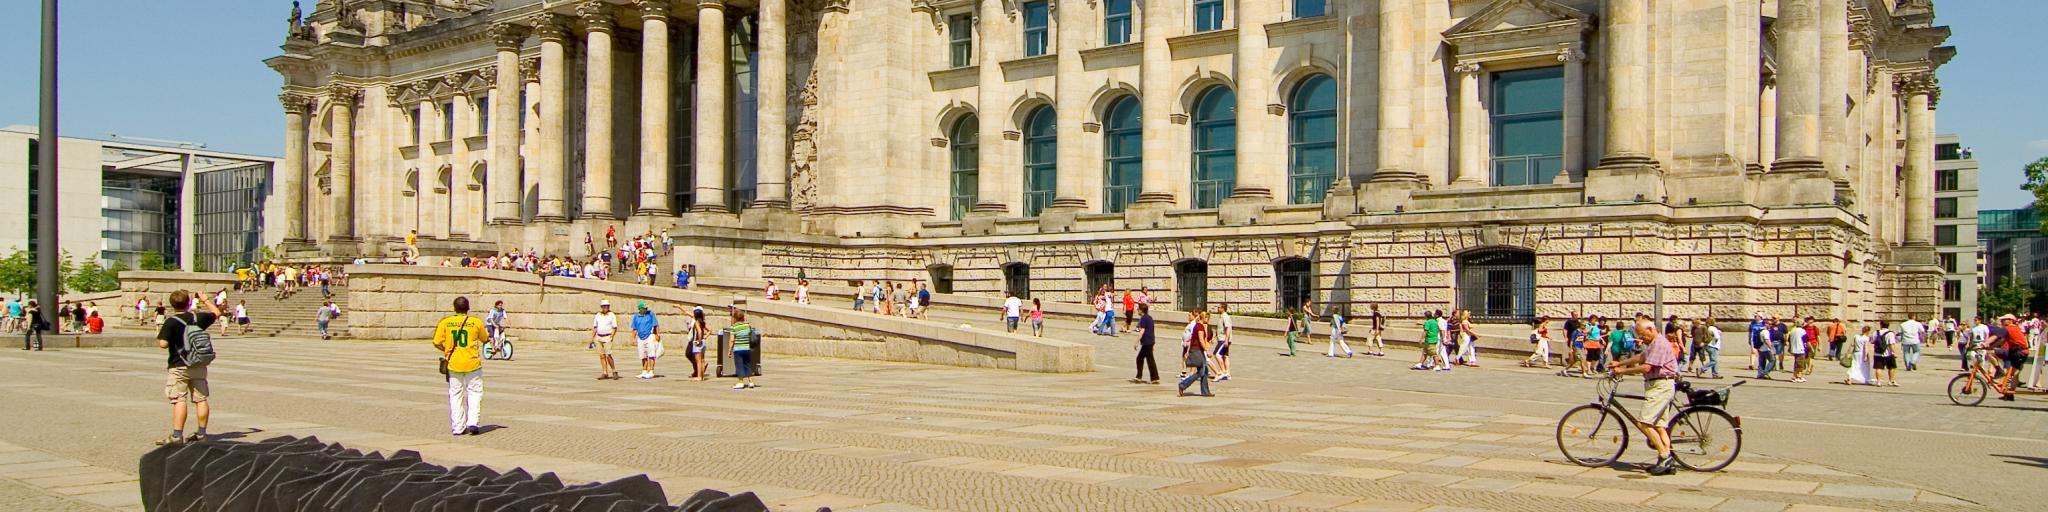 Berlin Reichstag of Berlin Germany